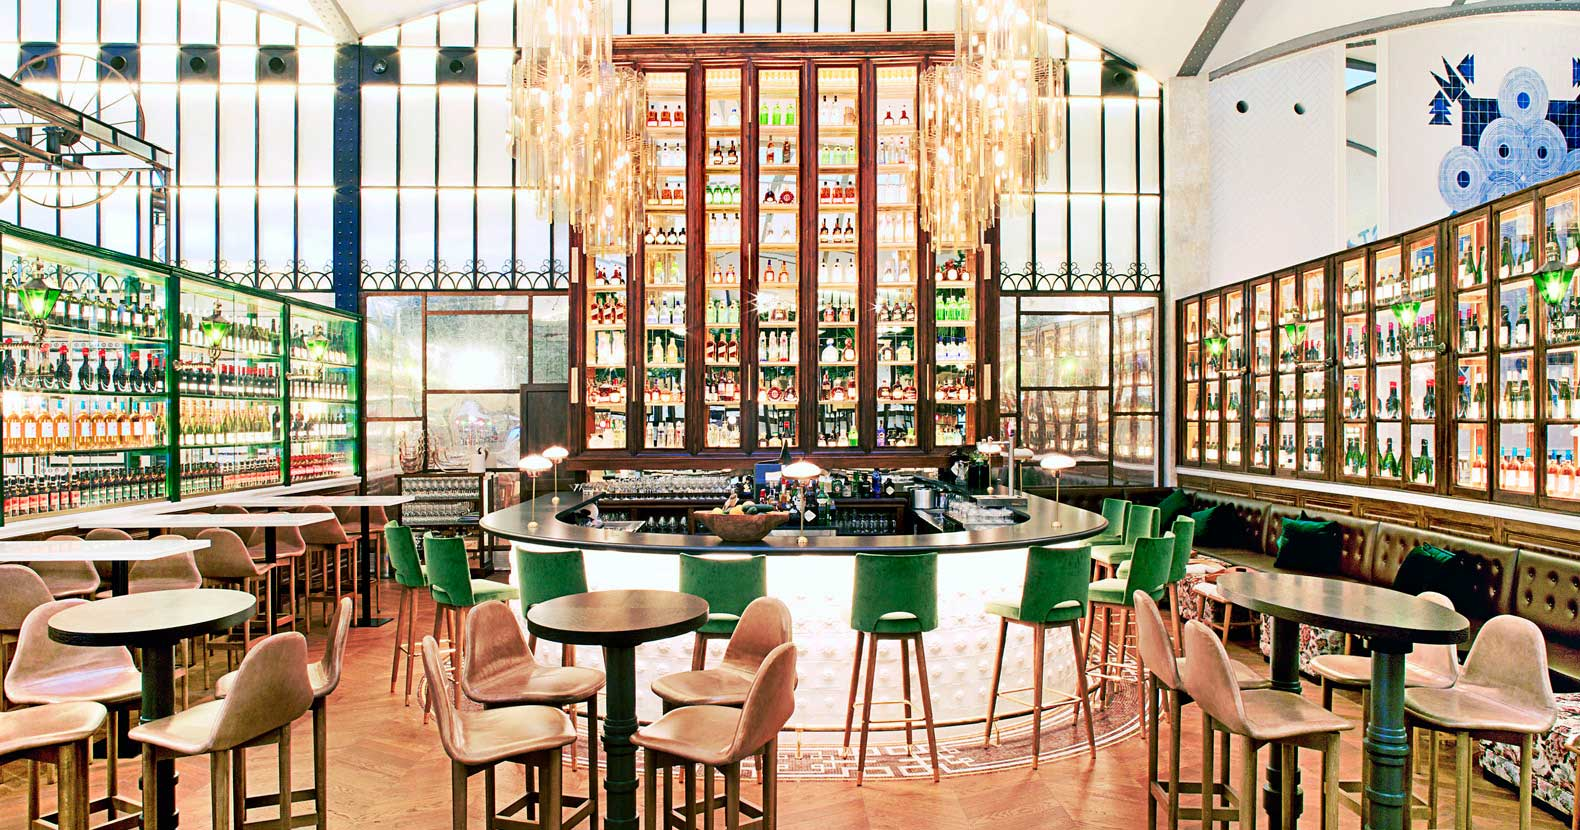 El_Nacional_Barcelona_restaurante_multidisciplinar_bar_16